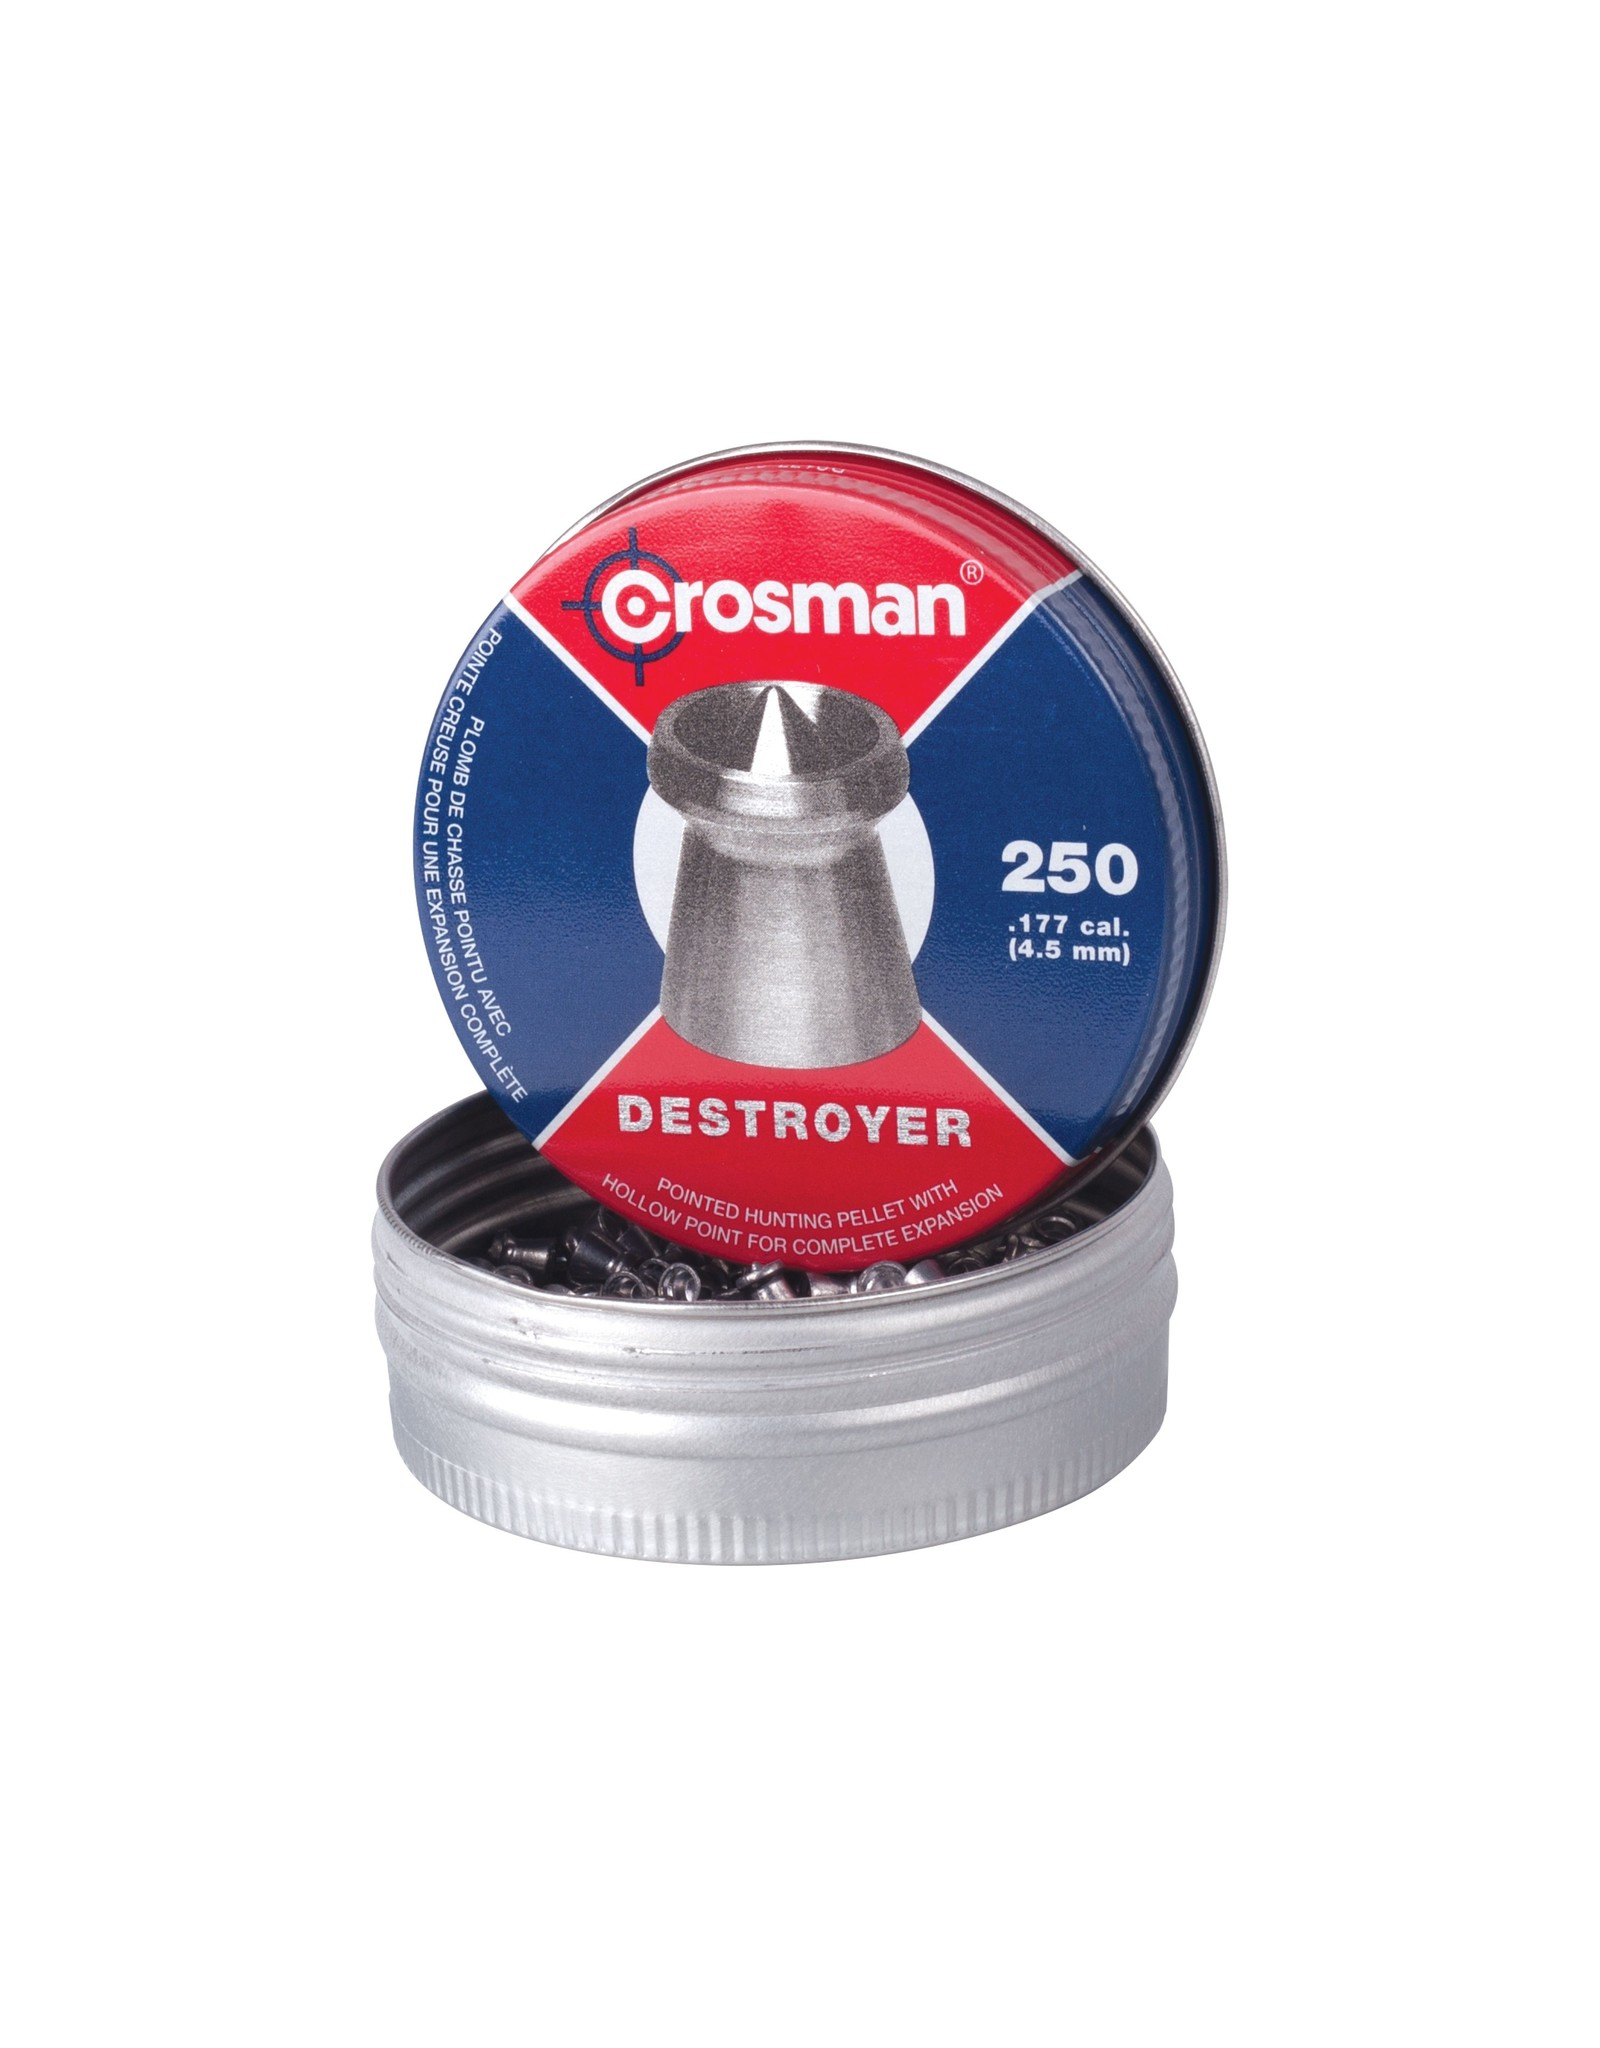 CROSMAN CROSMAN .177 DESTROYER 7.4gr PELLET (250ct)